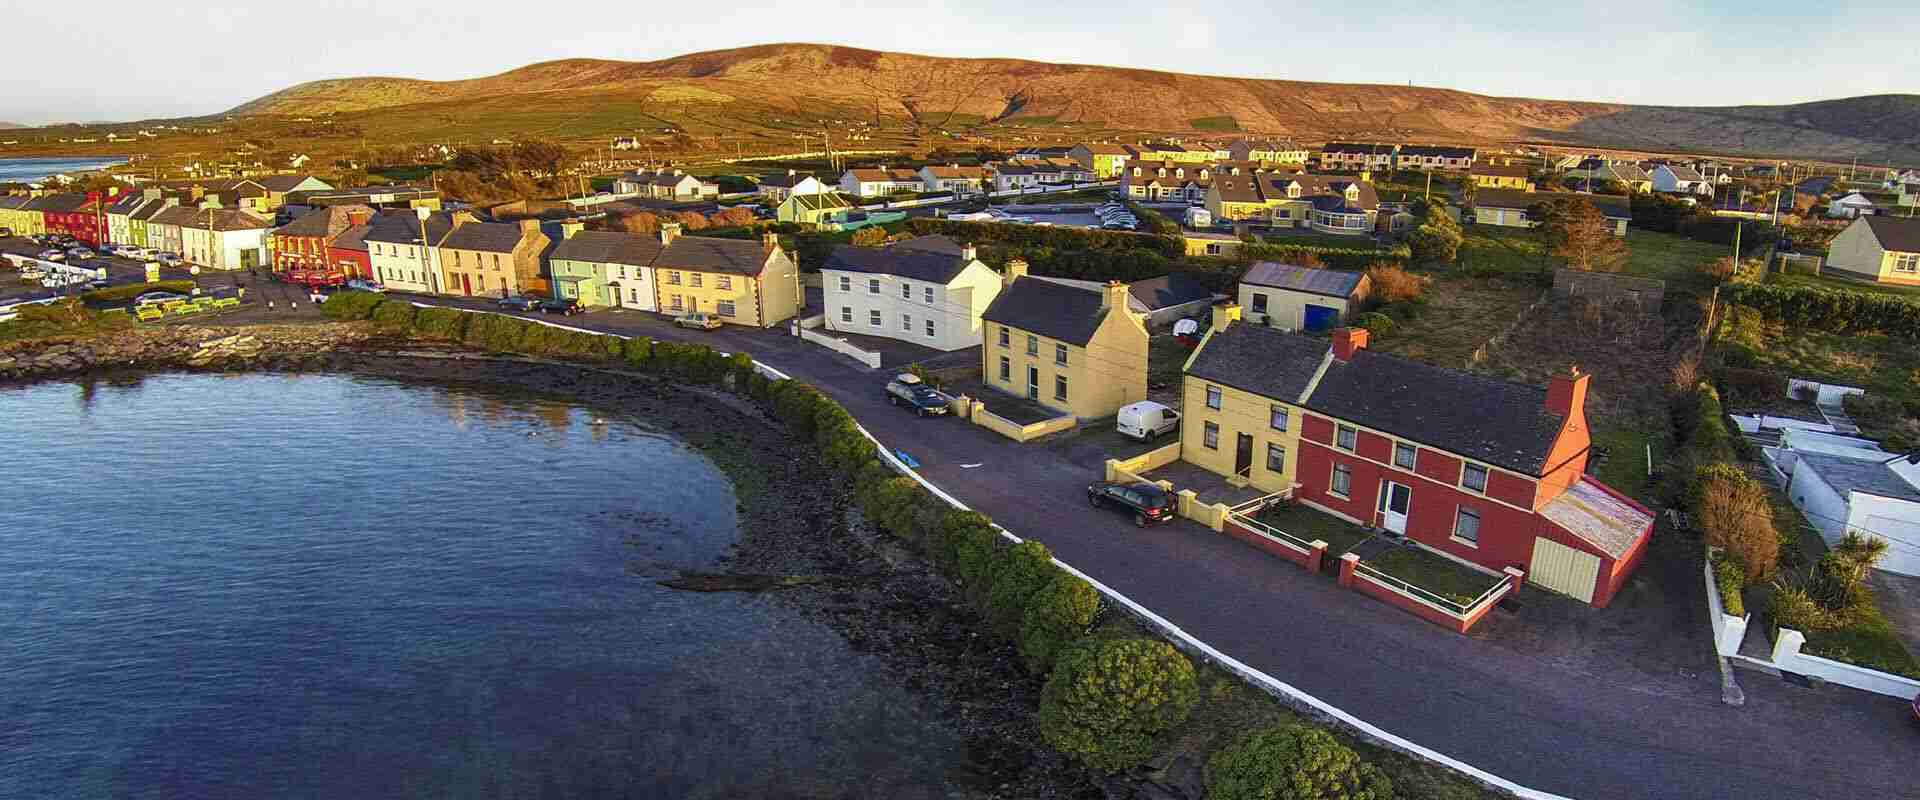 Village in Kerry